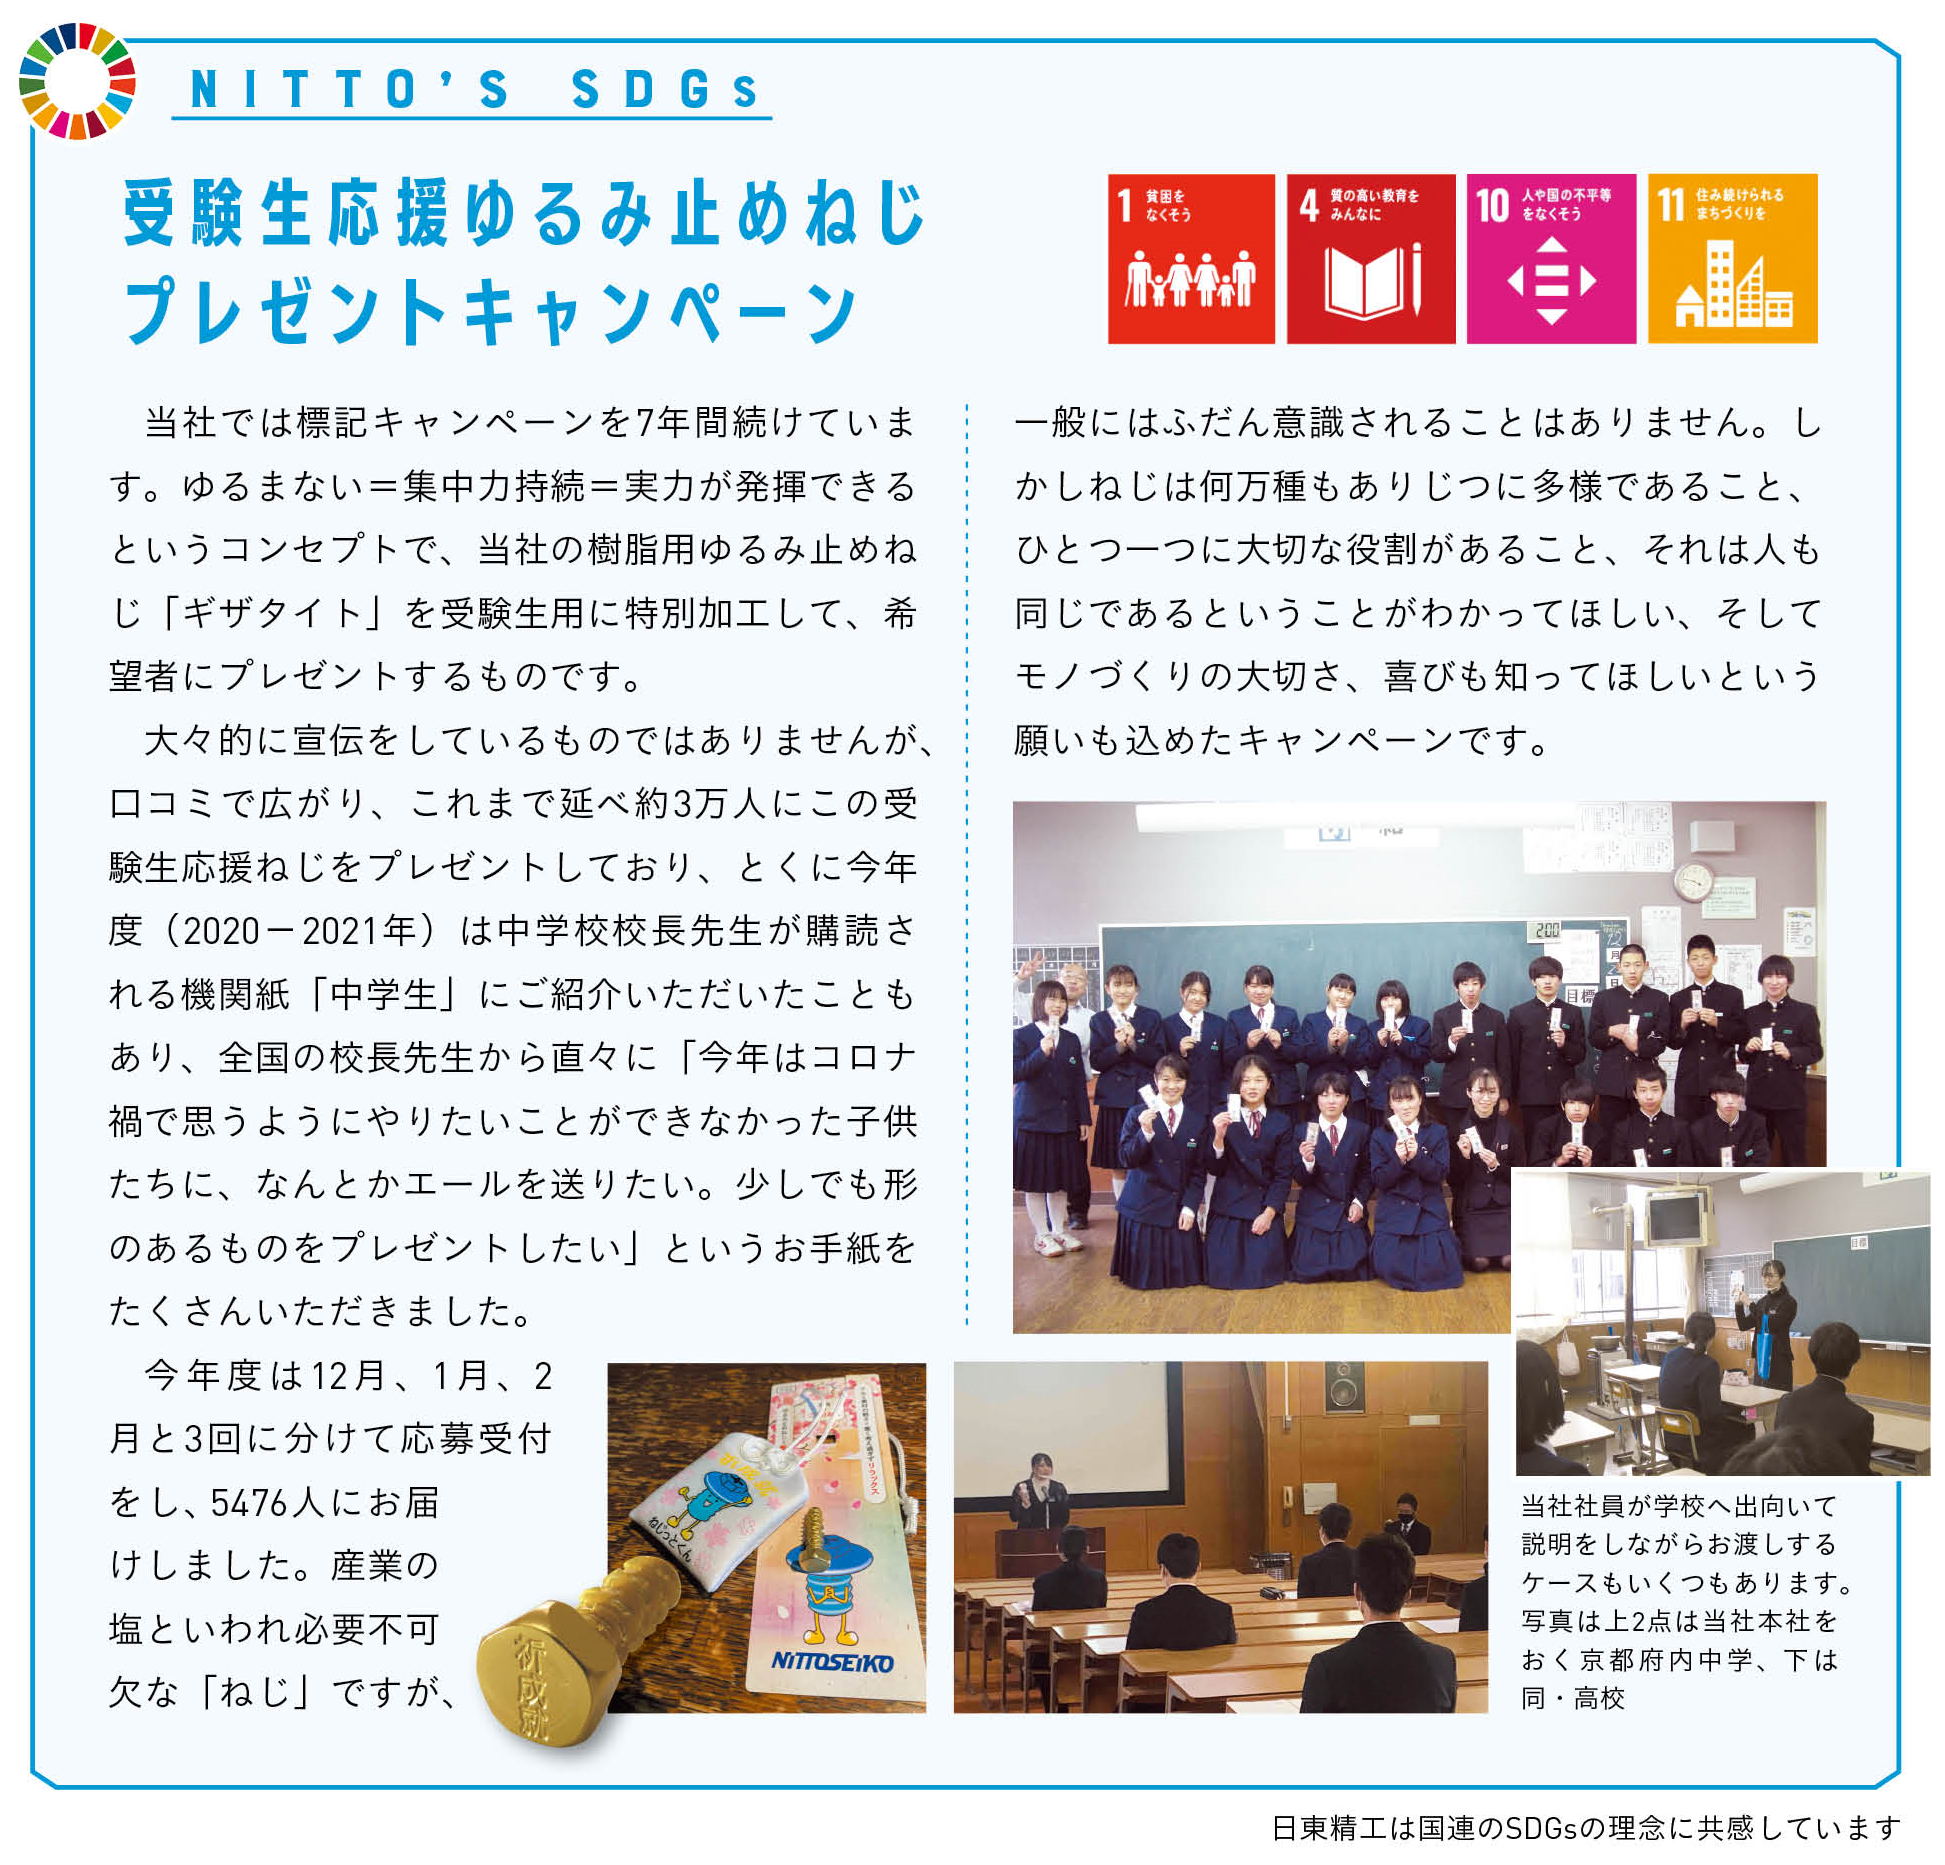 NITTO'S SDGs(受験生応援ゆるみ止めねじ)